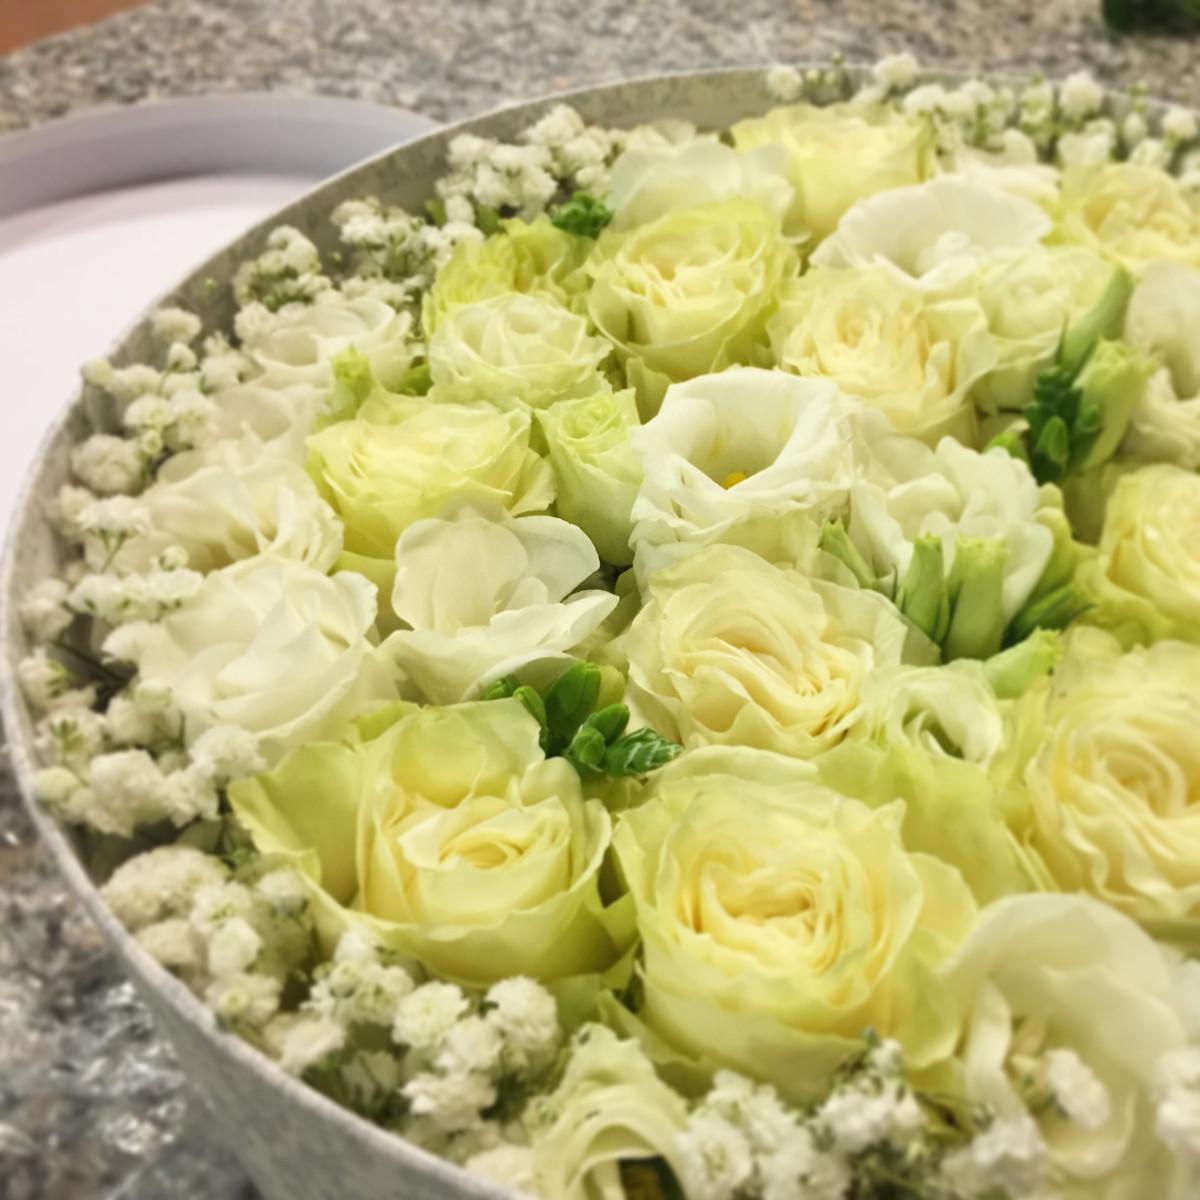 centrotavola flower box brescia manerbio